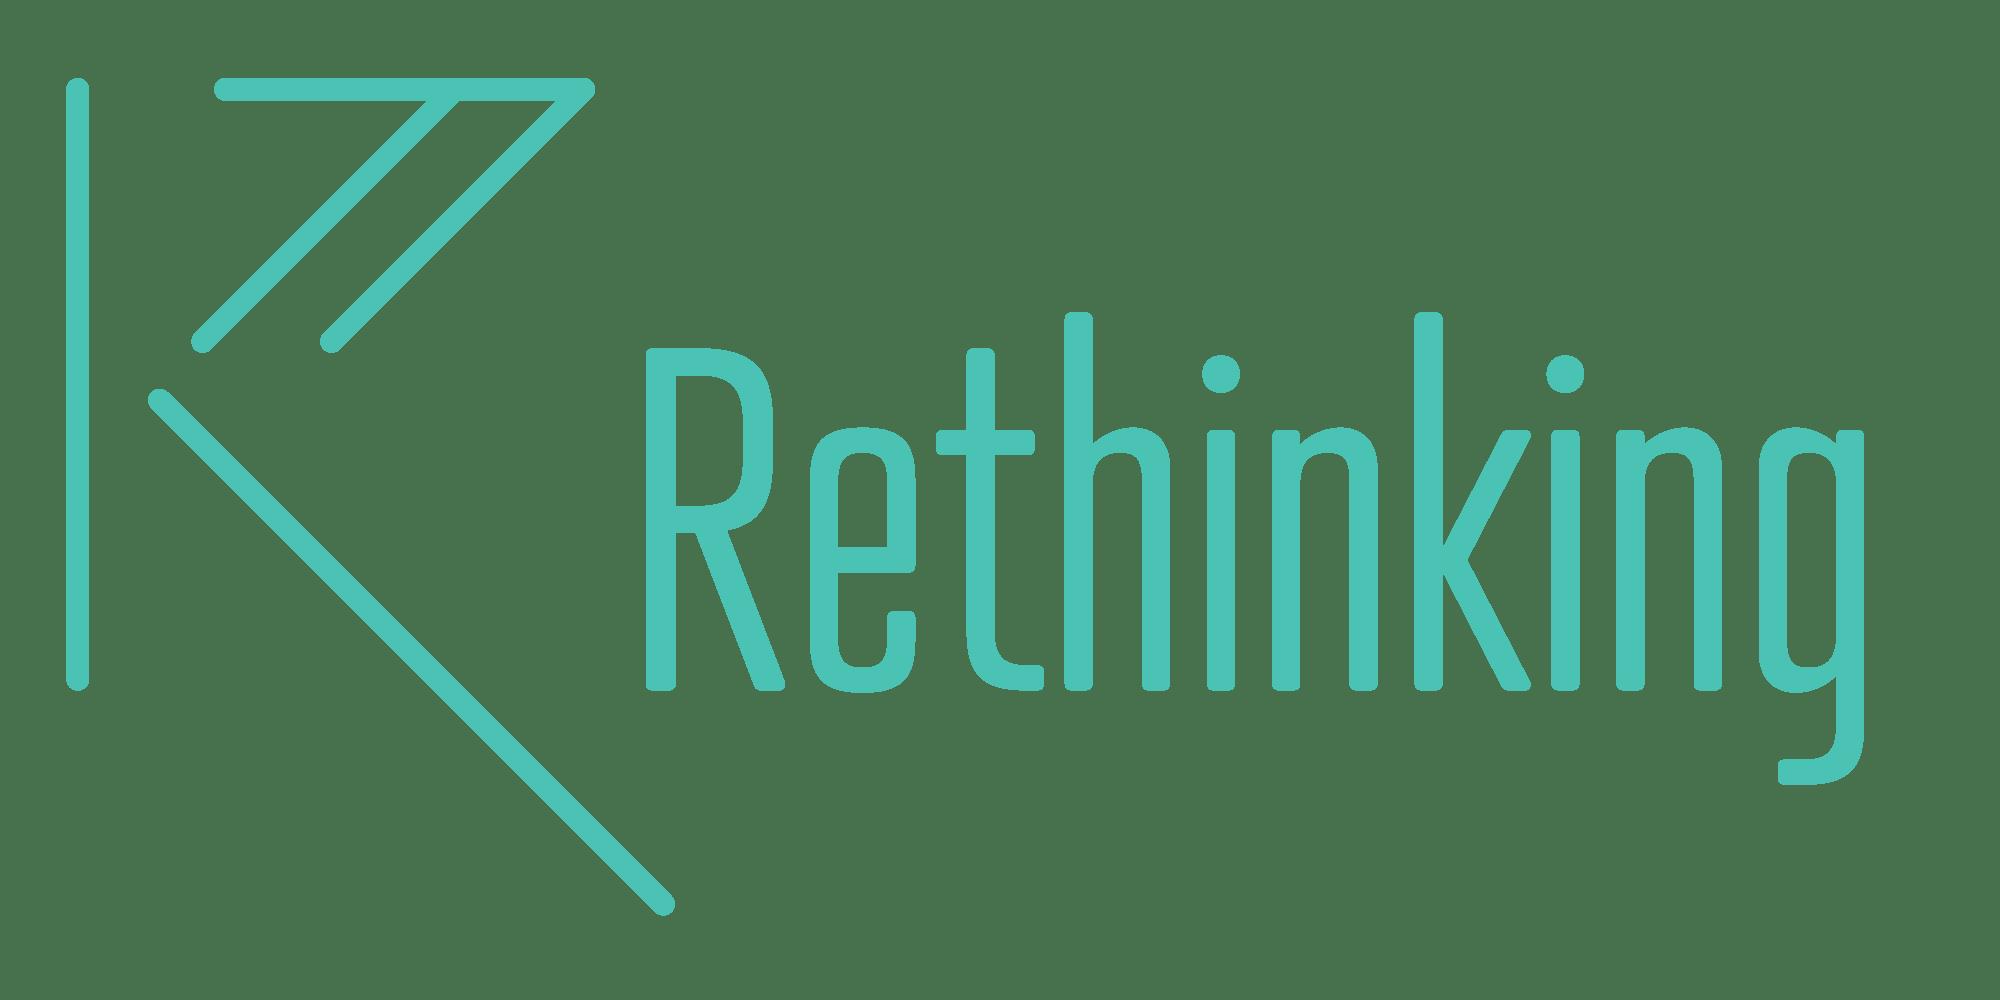 Rethinking-logo-grnn-RGB.png